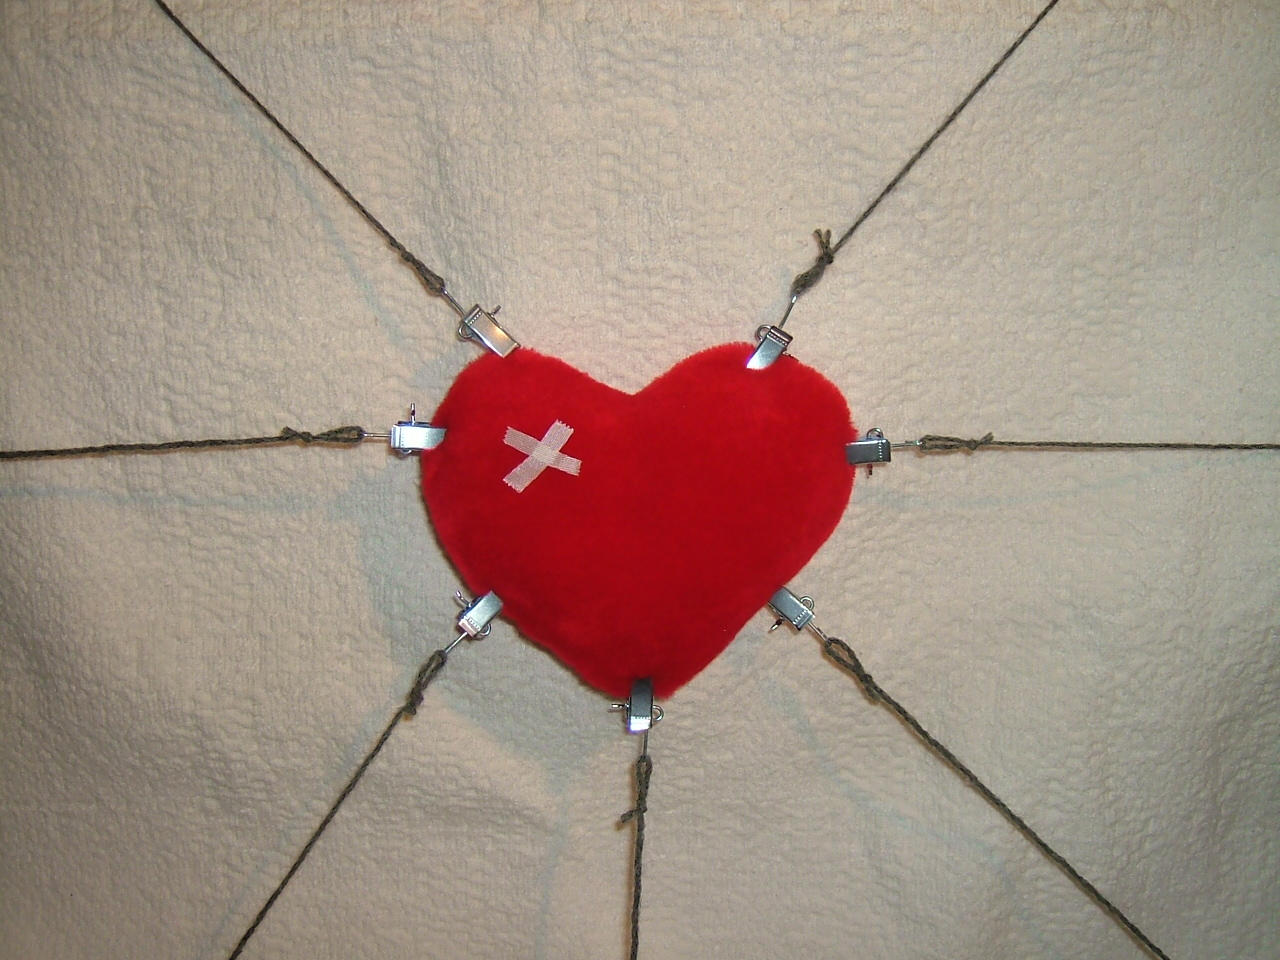 Heart - Torn apart by Futchi on DeviantArt